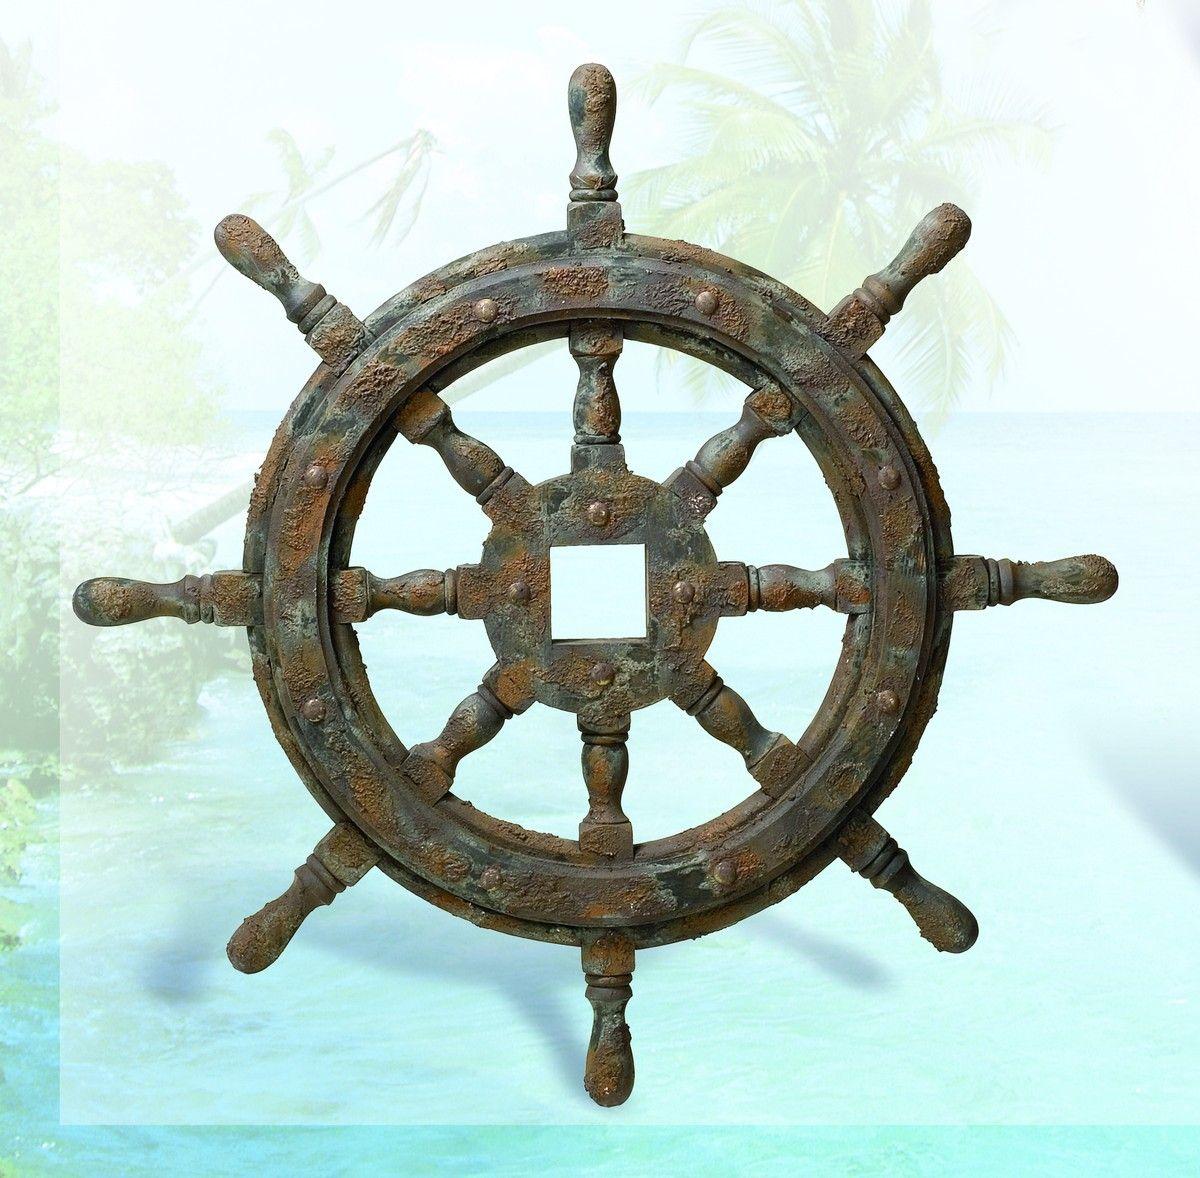 Nautical Ship Wheel Decor With Antique Finish 27 Ship Wheel Decor Wheel Decor Tropical Home Decor